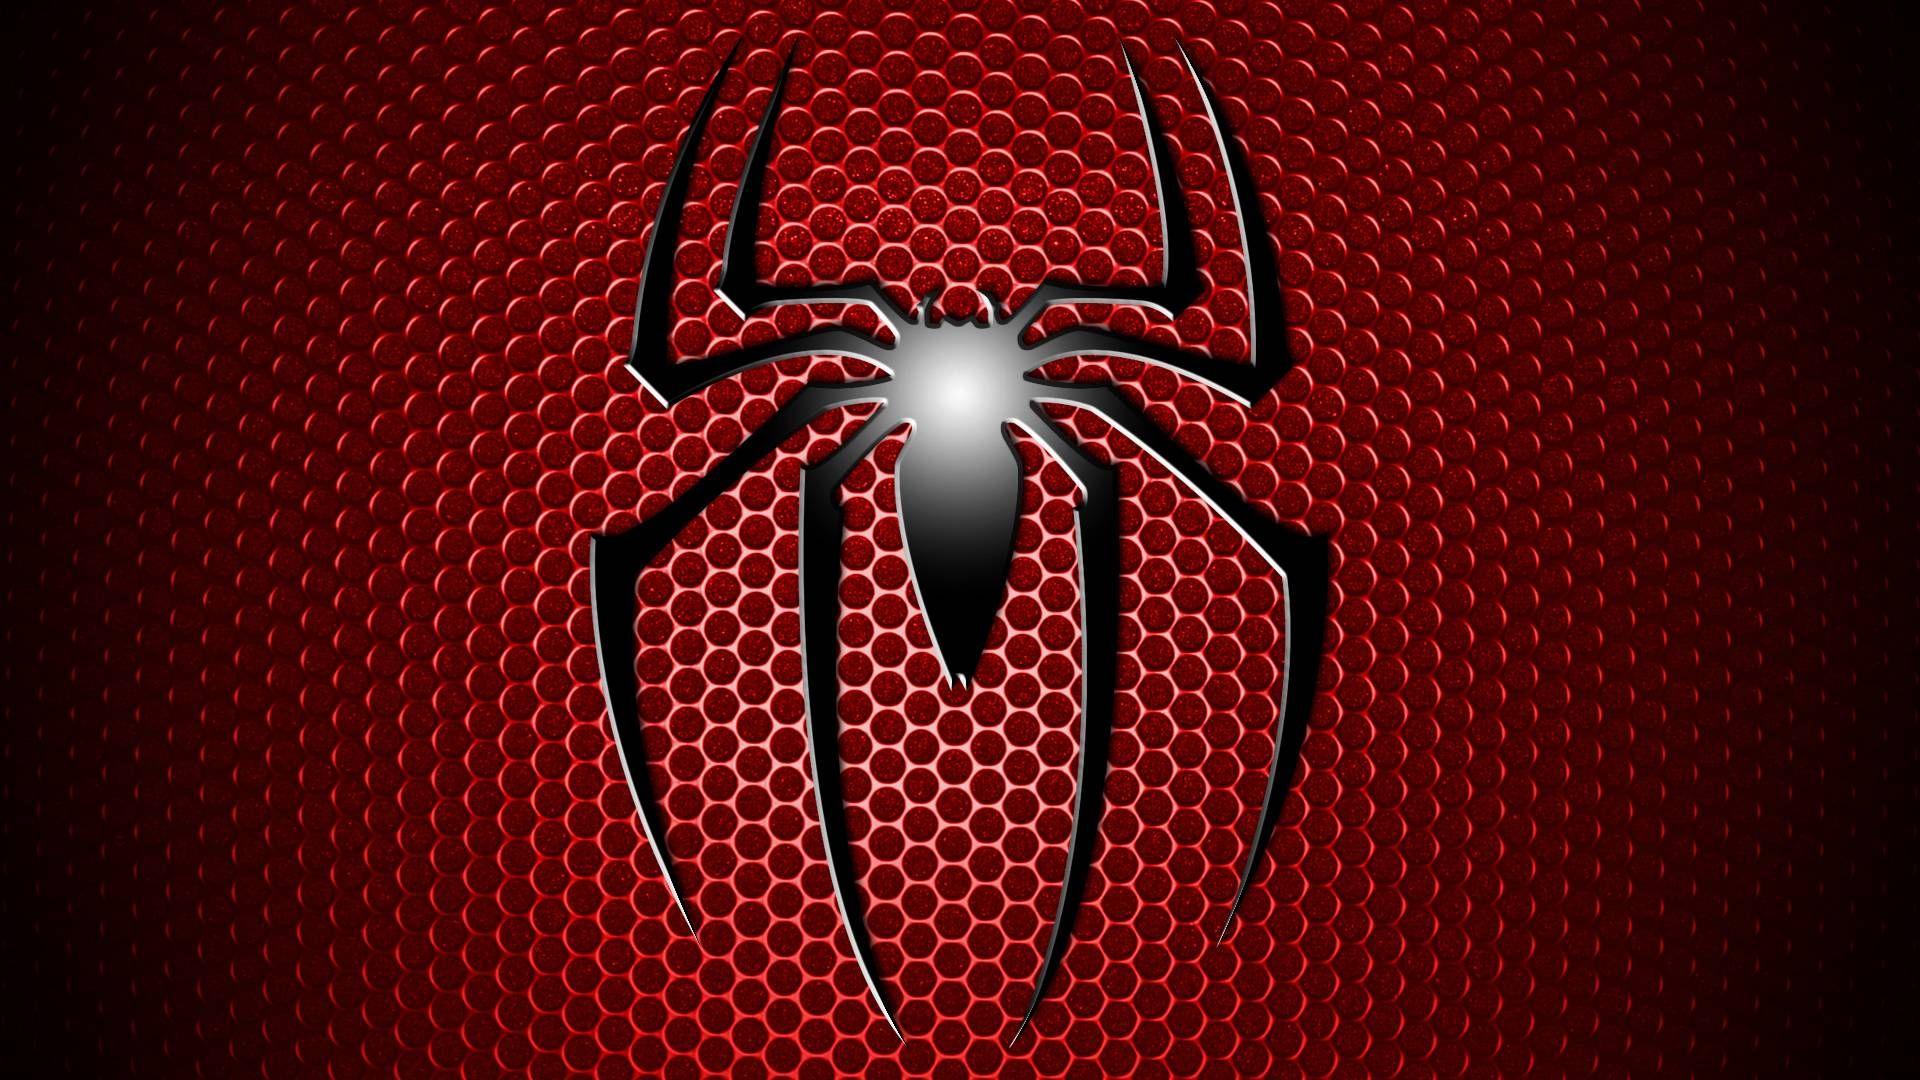 Spiderman Logo Wallpaper Widescreen C5M